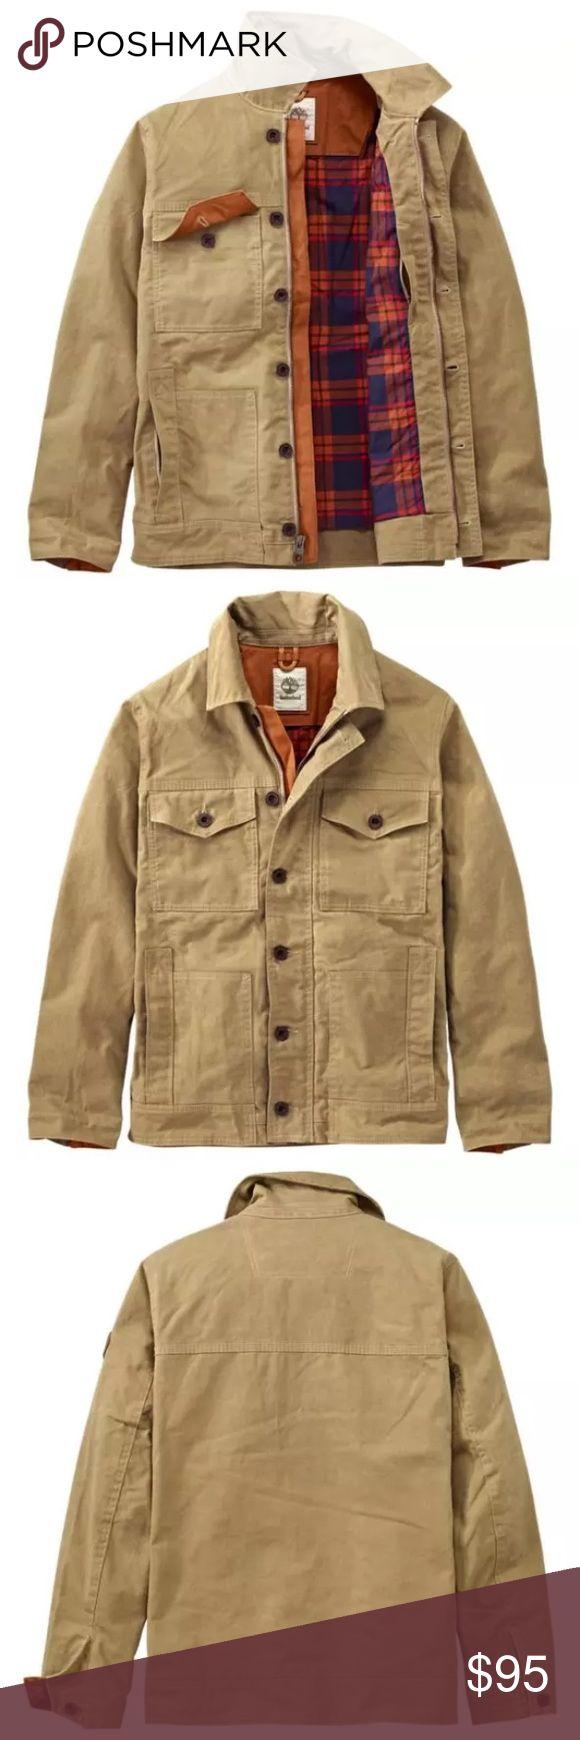 Timberland wax jacket Timberland men's wax jacket Timberland Jackets & Coats Lightweight & Shirt Jackets